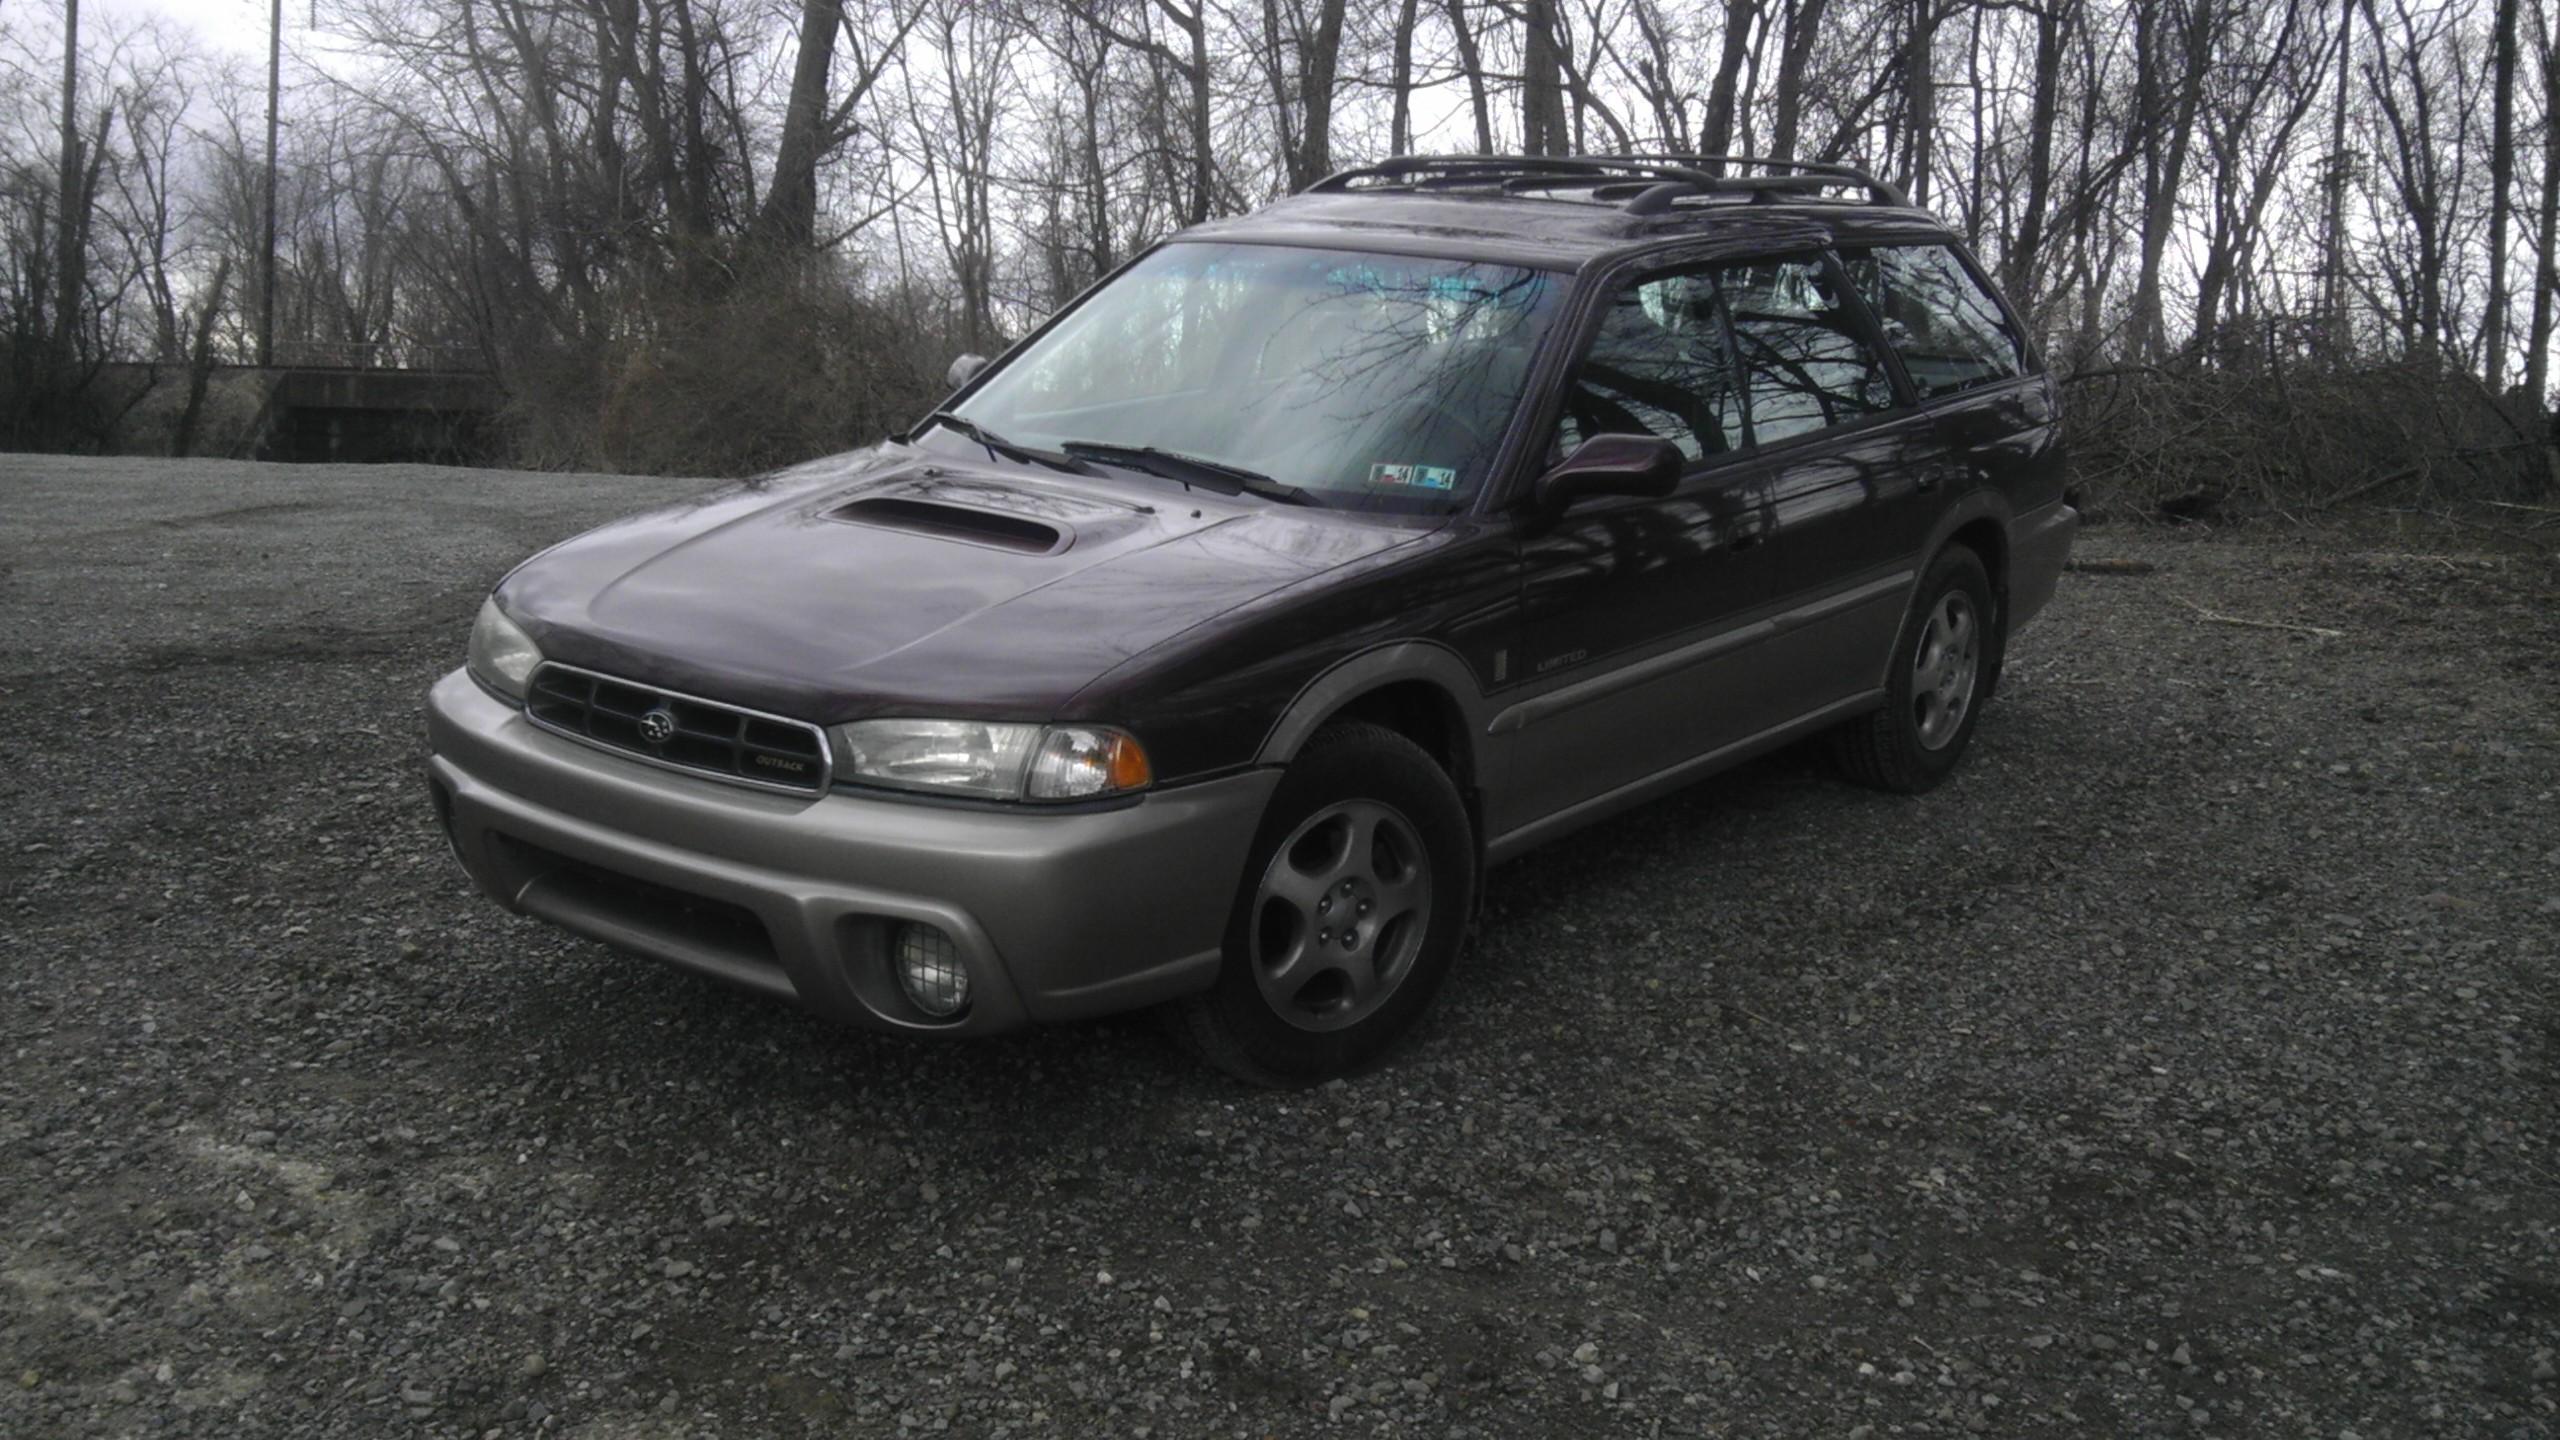 Maroon 1999 Subaru (Legacy?) Outback Limited rims - Subaru ...